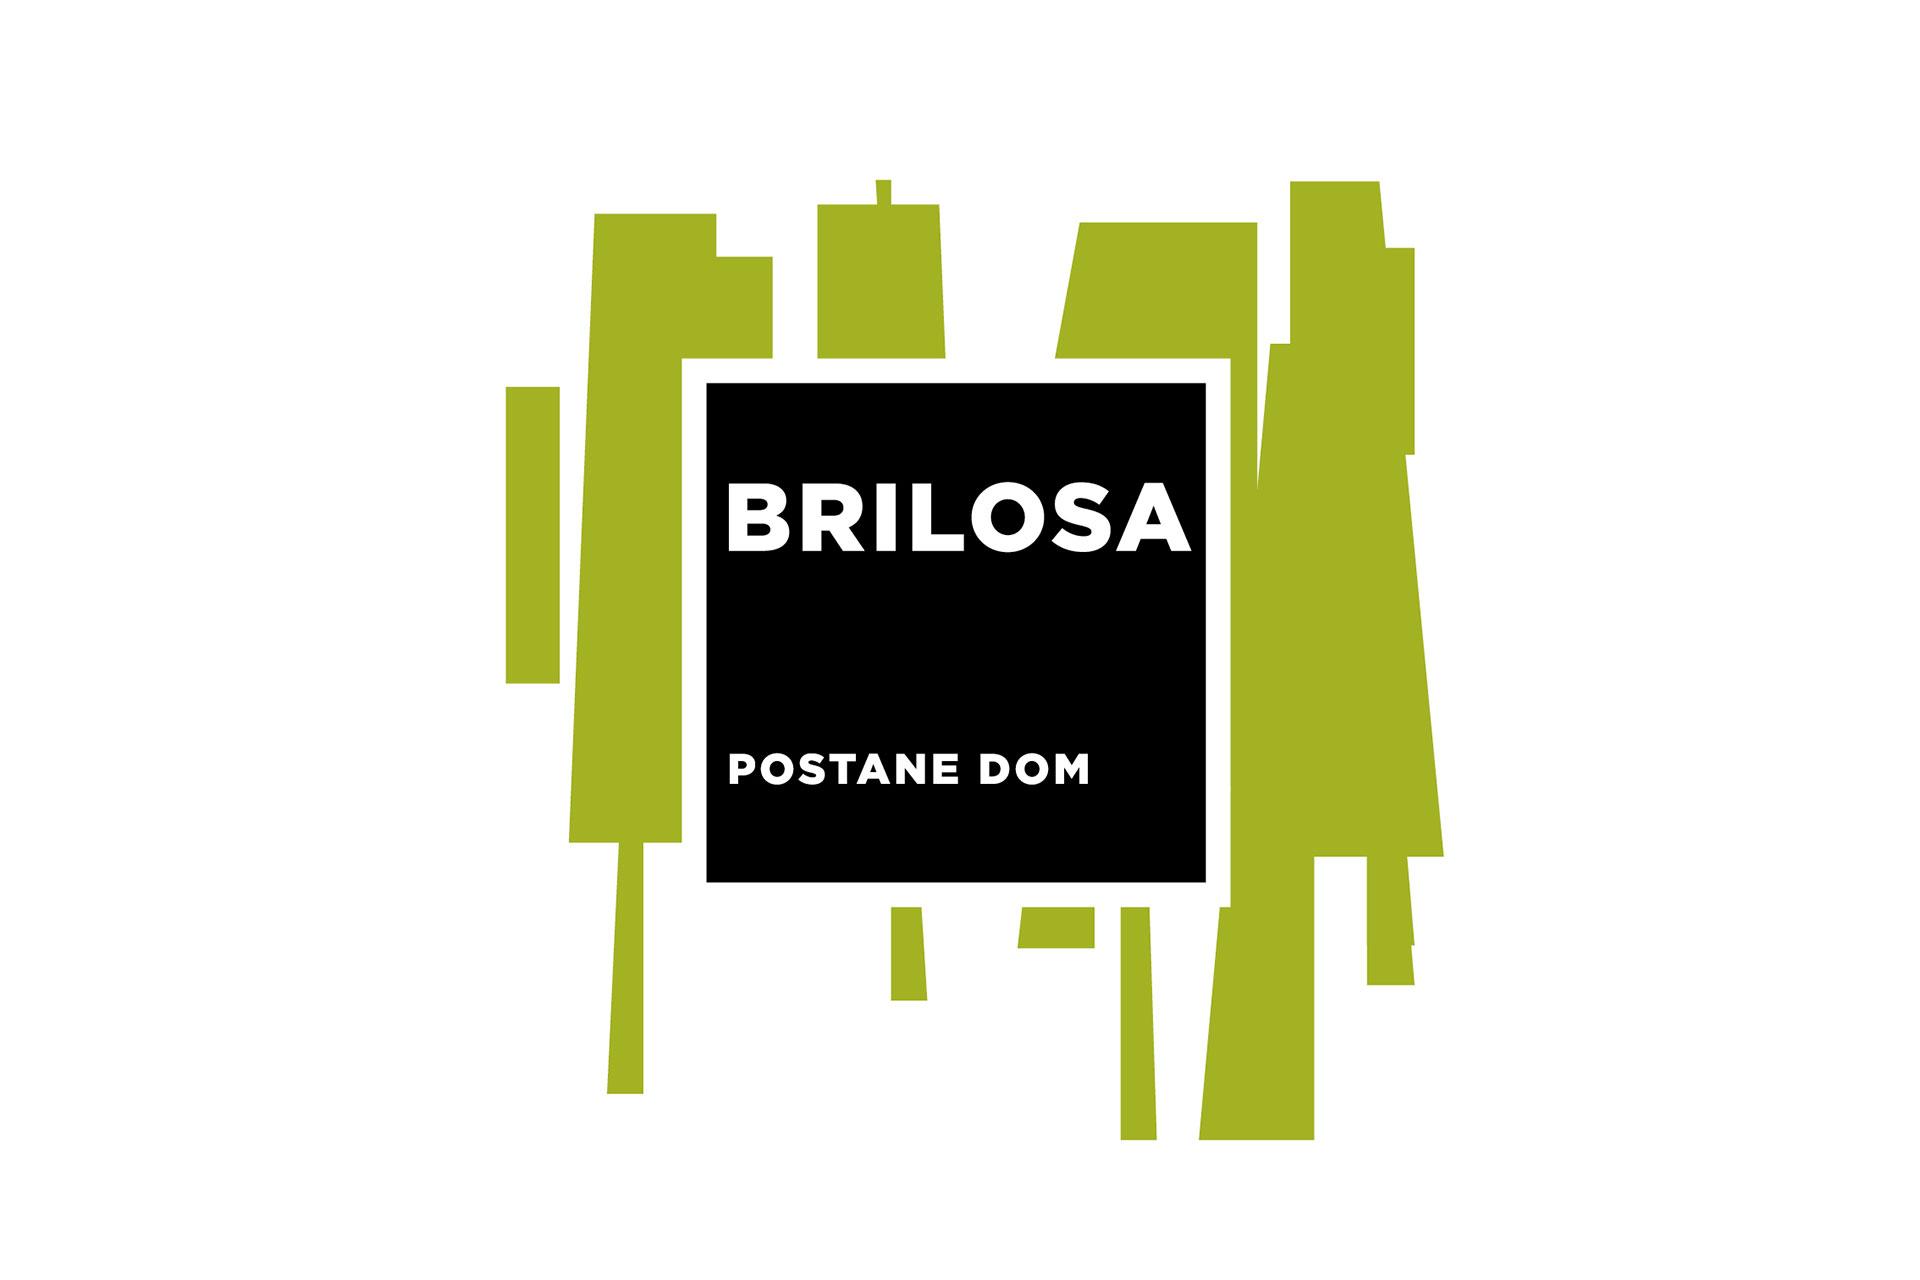 brilosa_marko-marinsek-studio-ma-ma_vizualna_vizualna_znak_